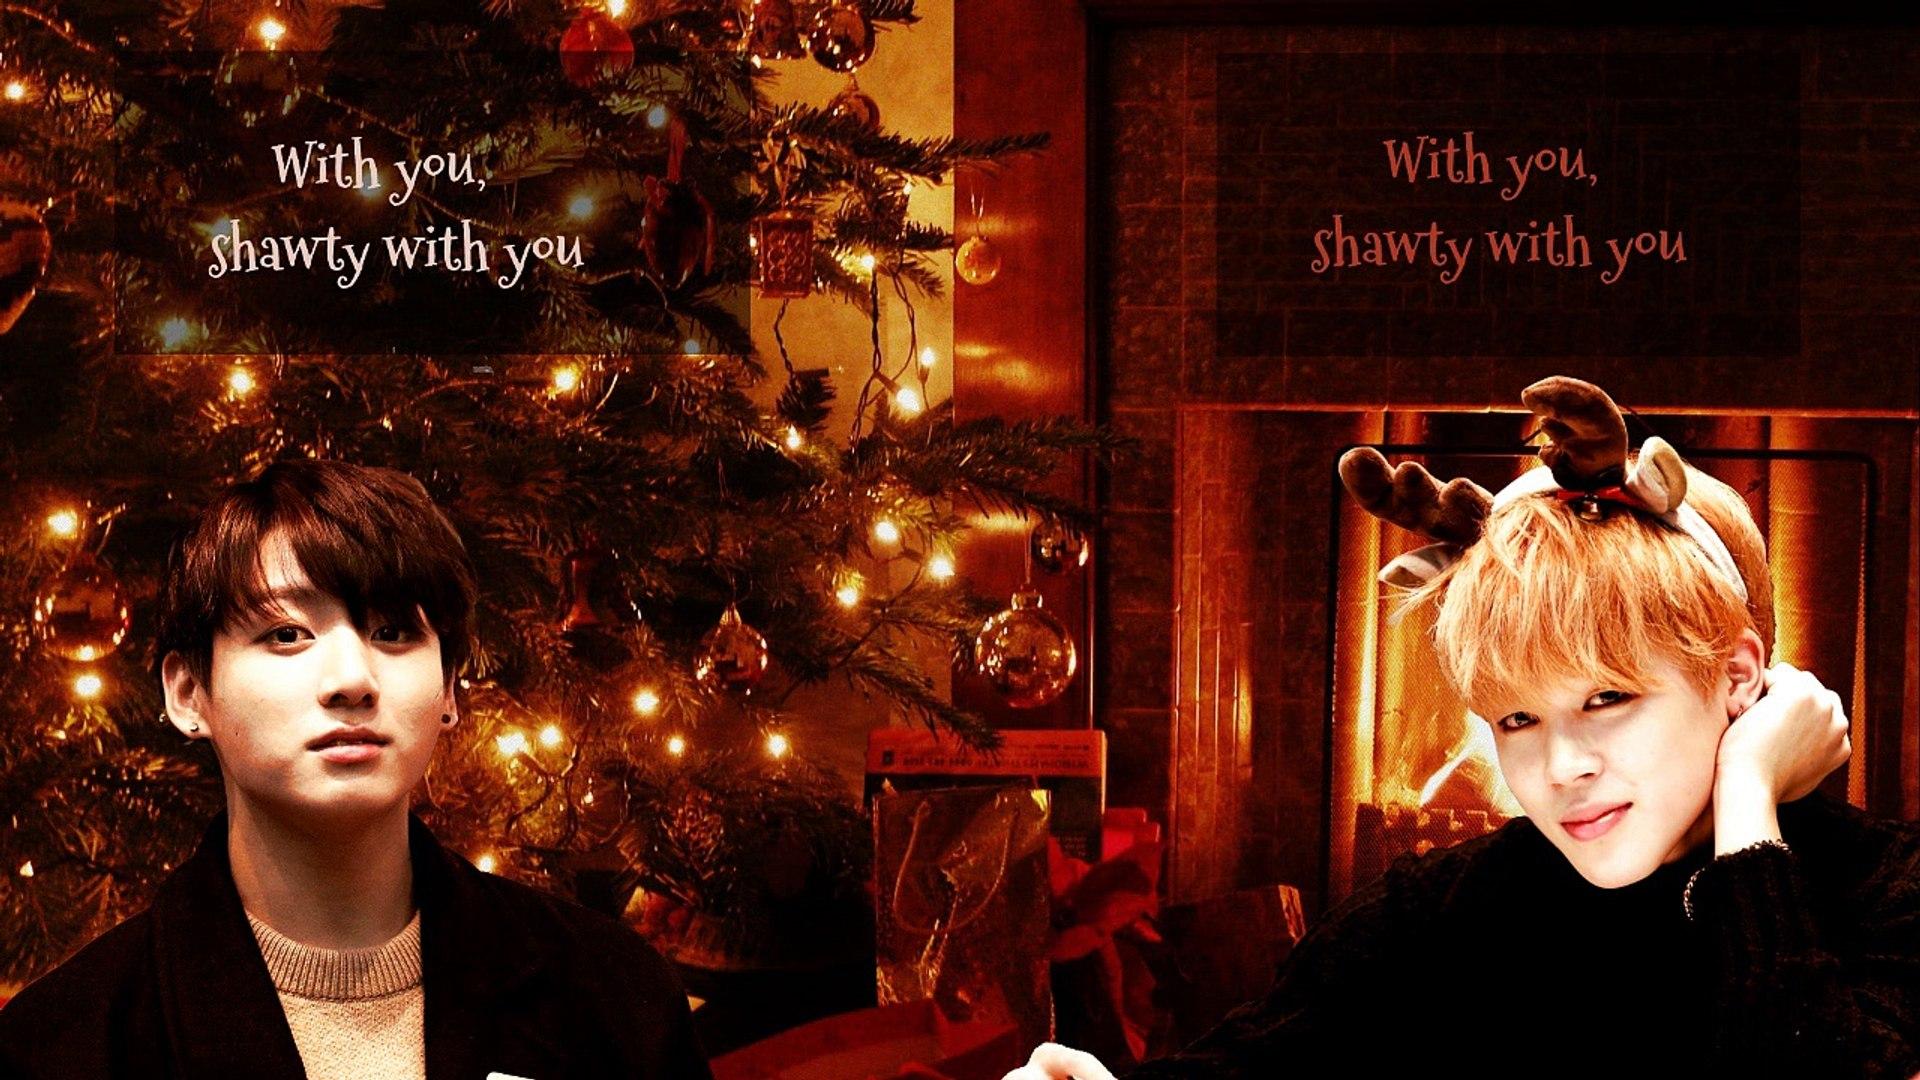 Christmas Day [Karaoke sing with Jungkook & Jimin]